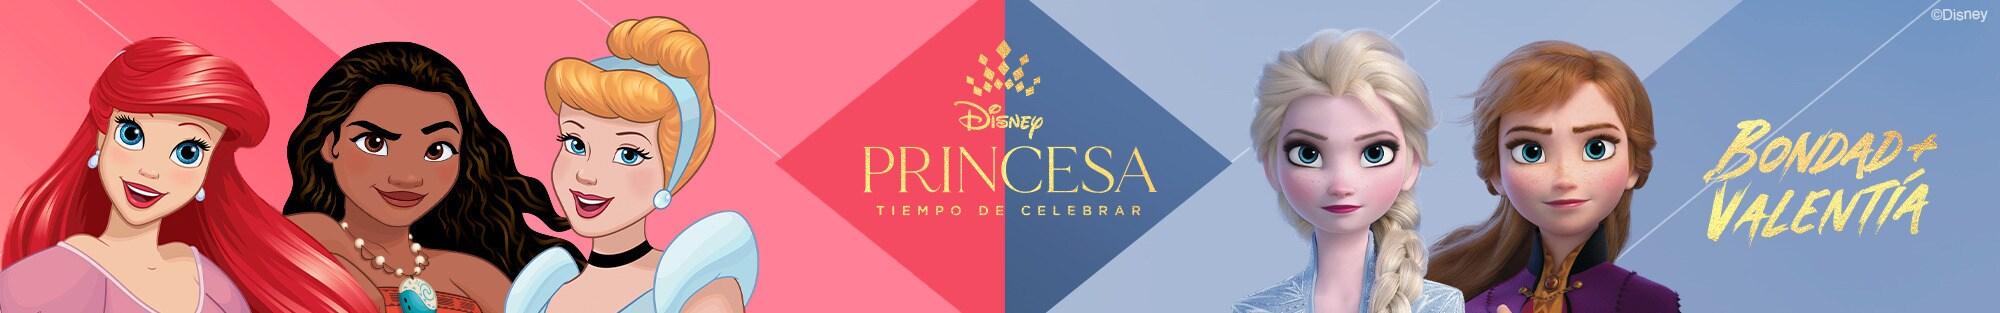 Mid_ShopDisney_Apr21_Princesas Ebooks Home Ebooks MX v2